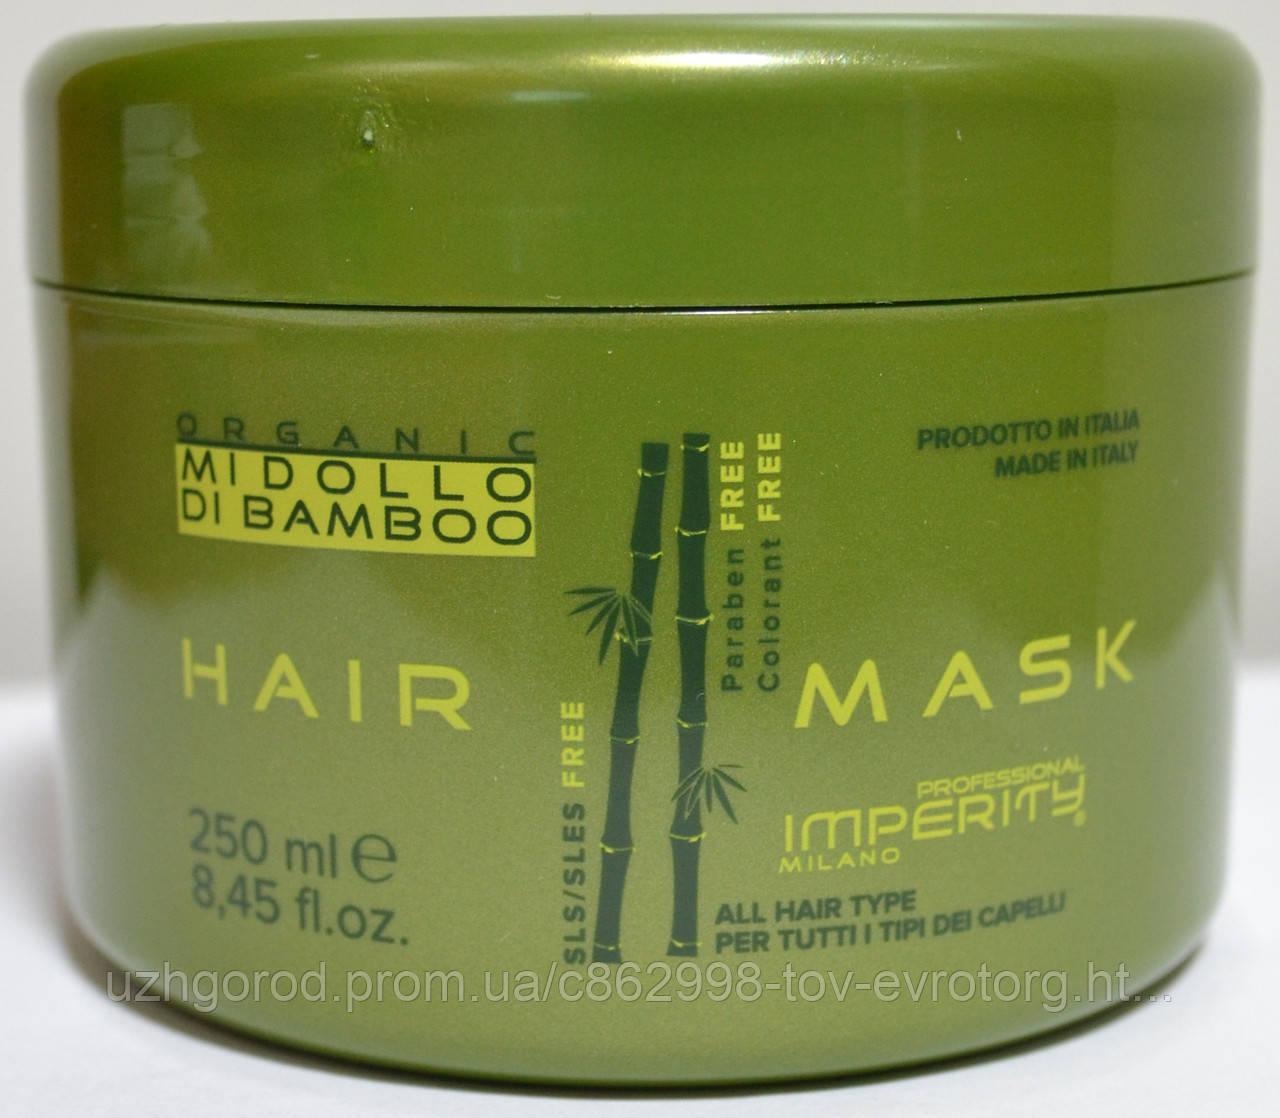 Маска для волос Professional Imperity hair mask mi dollo di bamboo 0,250 мл